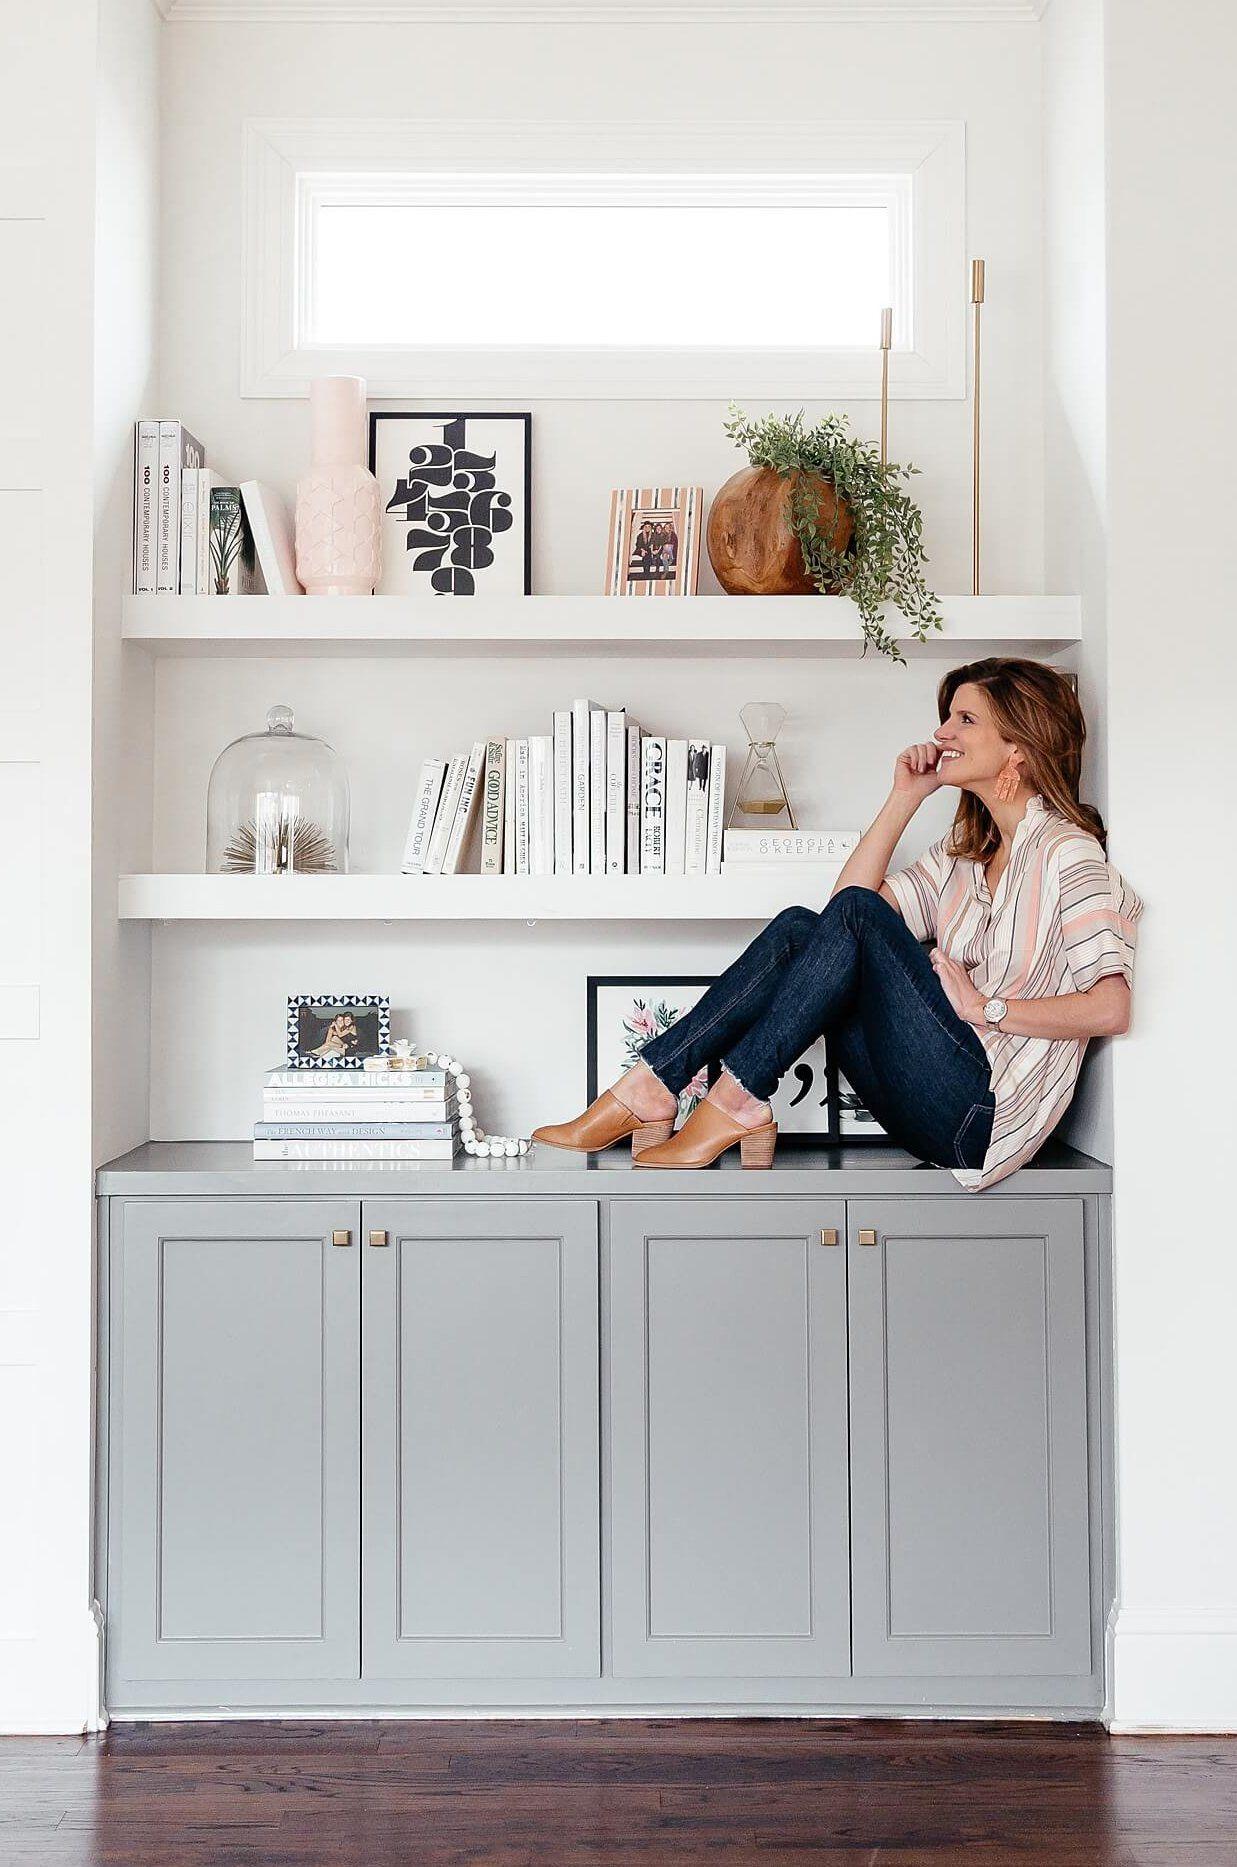 How To Style Bookshelves Brightontheday Bookshelves In Li